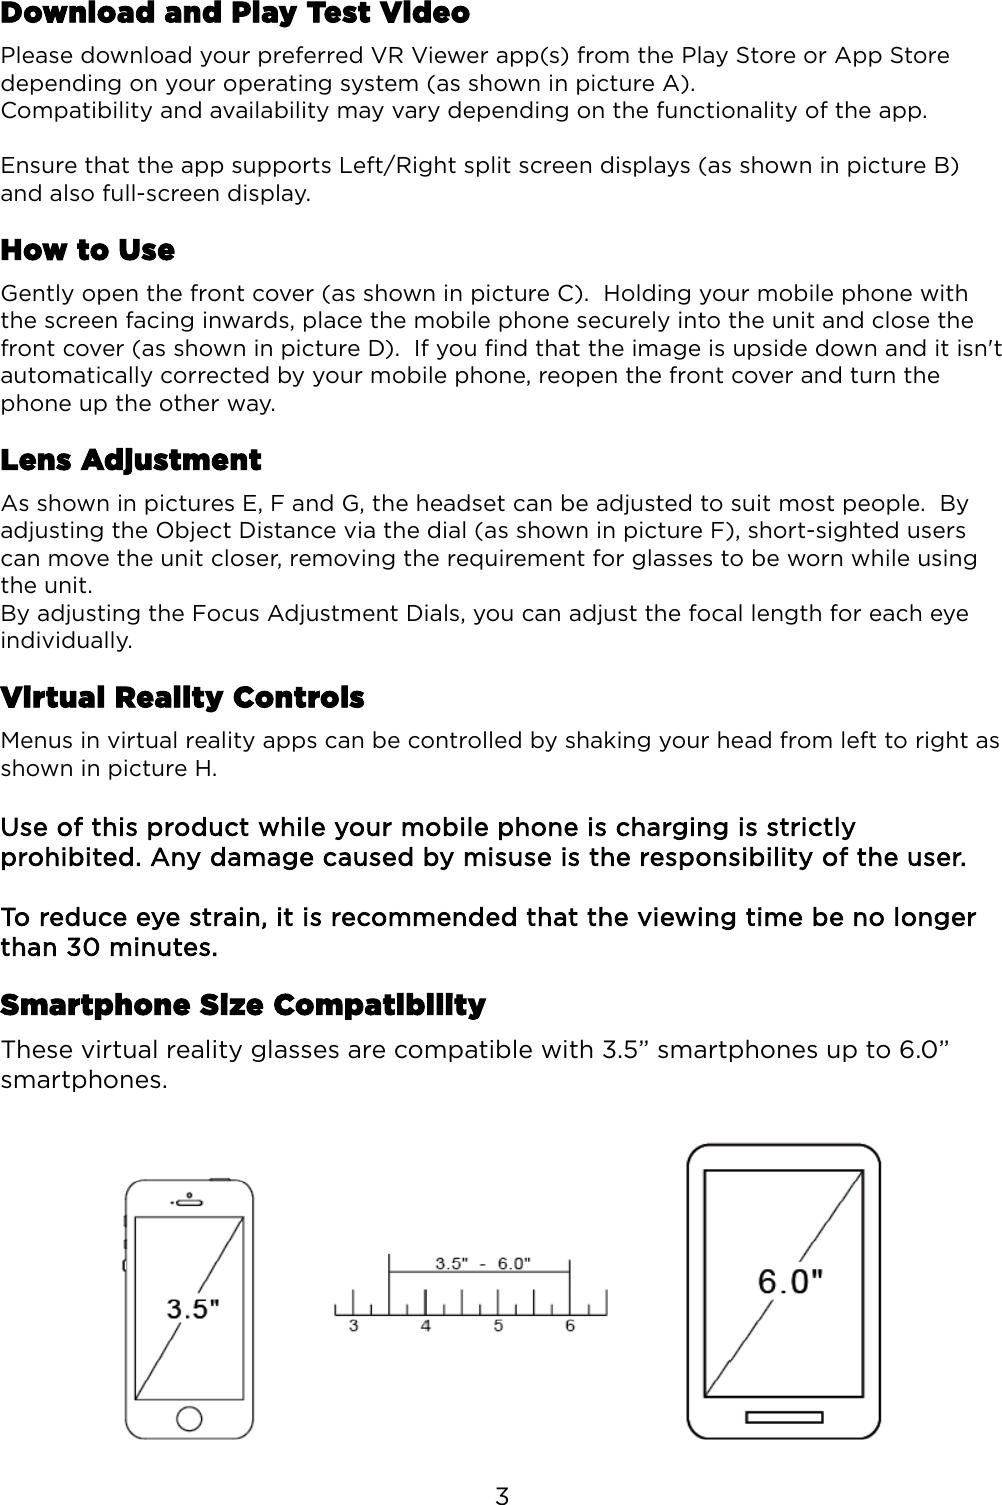 KAVRHEADSETA Virtual Reality Headset For Smartphones User